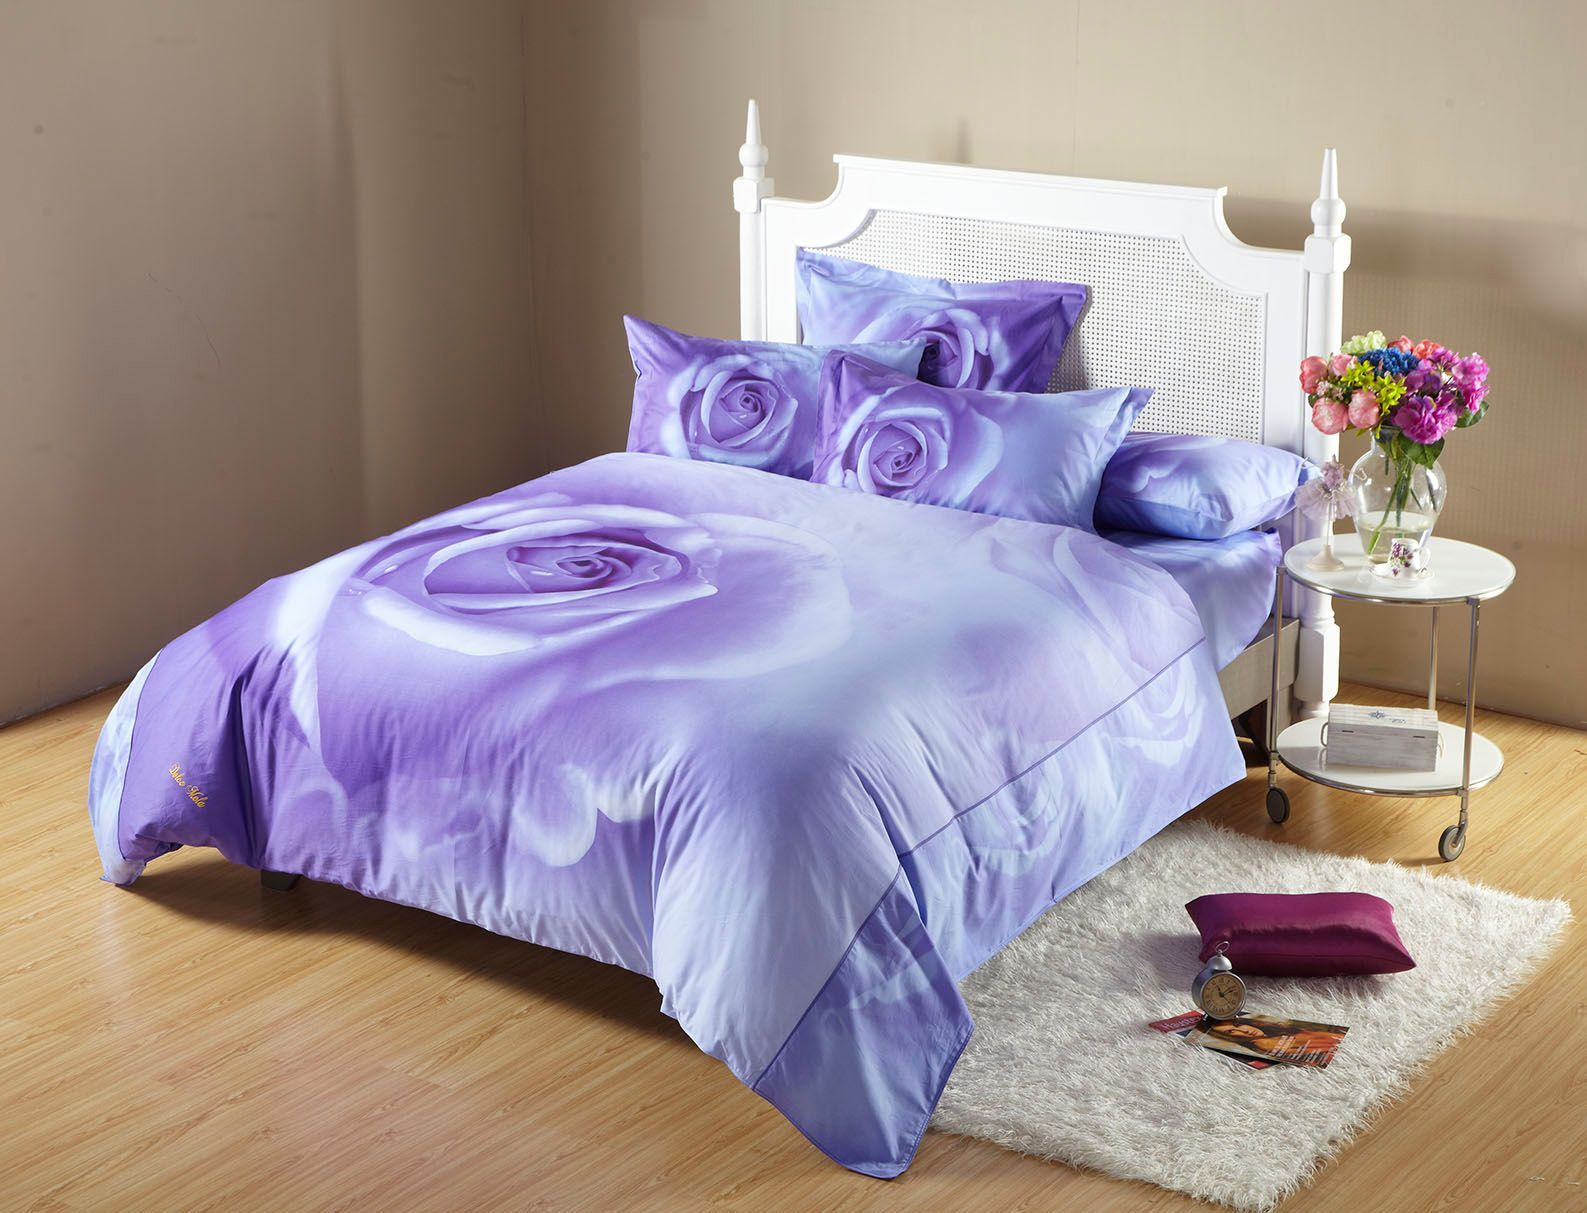 Midnight Rose Purple Floral Bedding Romantic Duvet Set King OR Full